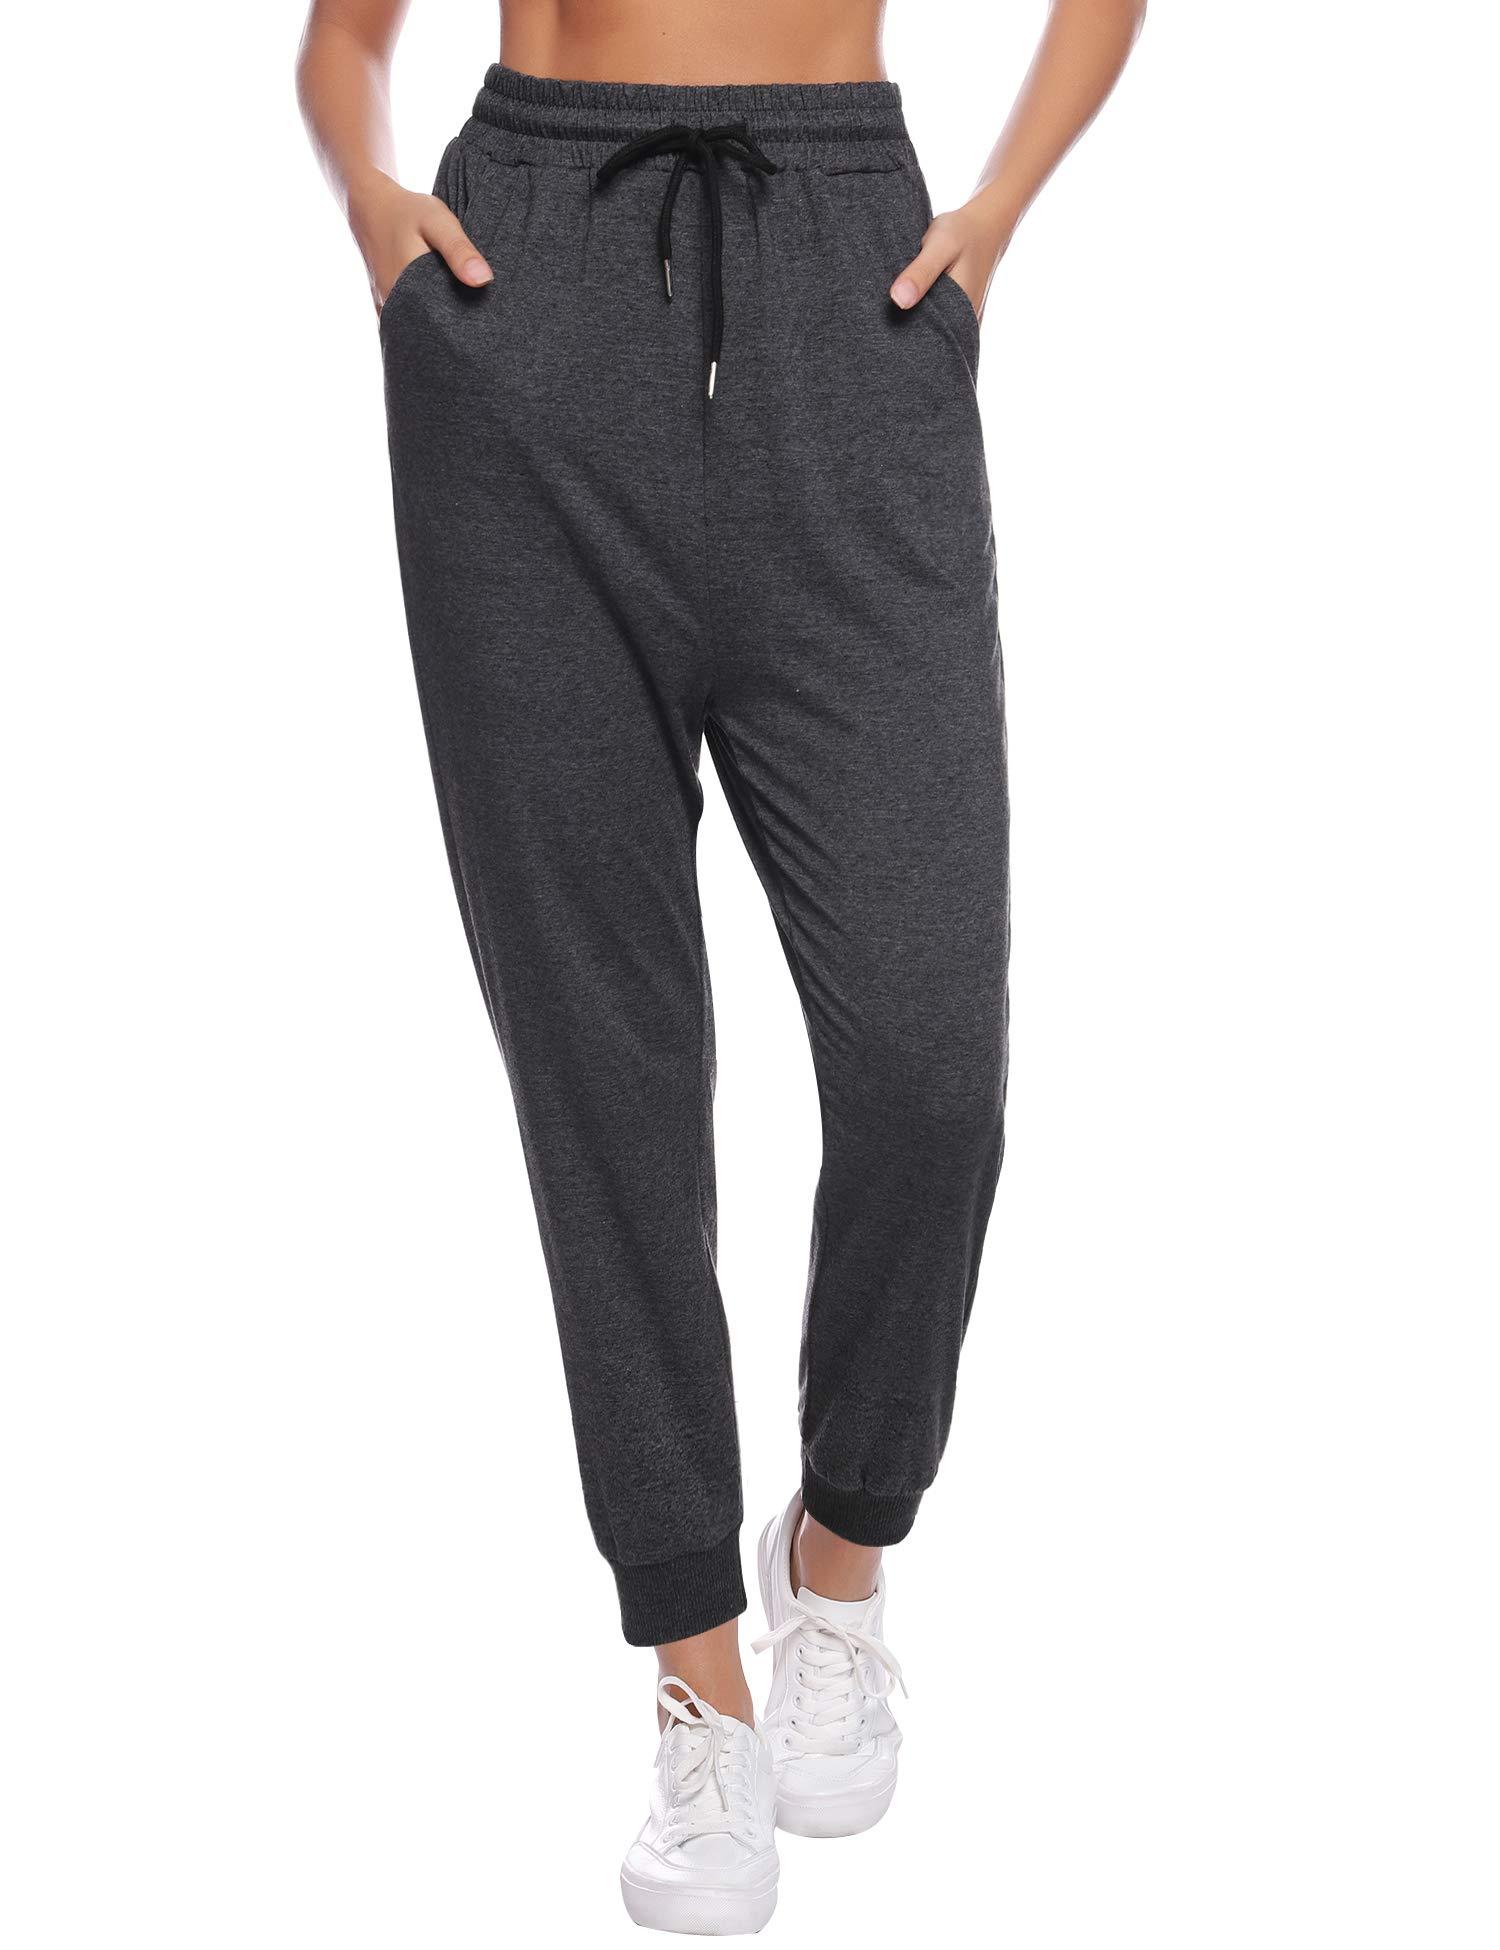 Aibrou Womens Cotton Pajama Pants for Women Active Yoga Sweatpants Soft Sleep Pants for Lounge Pants Yoga Workout Bottoms